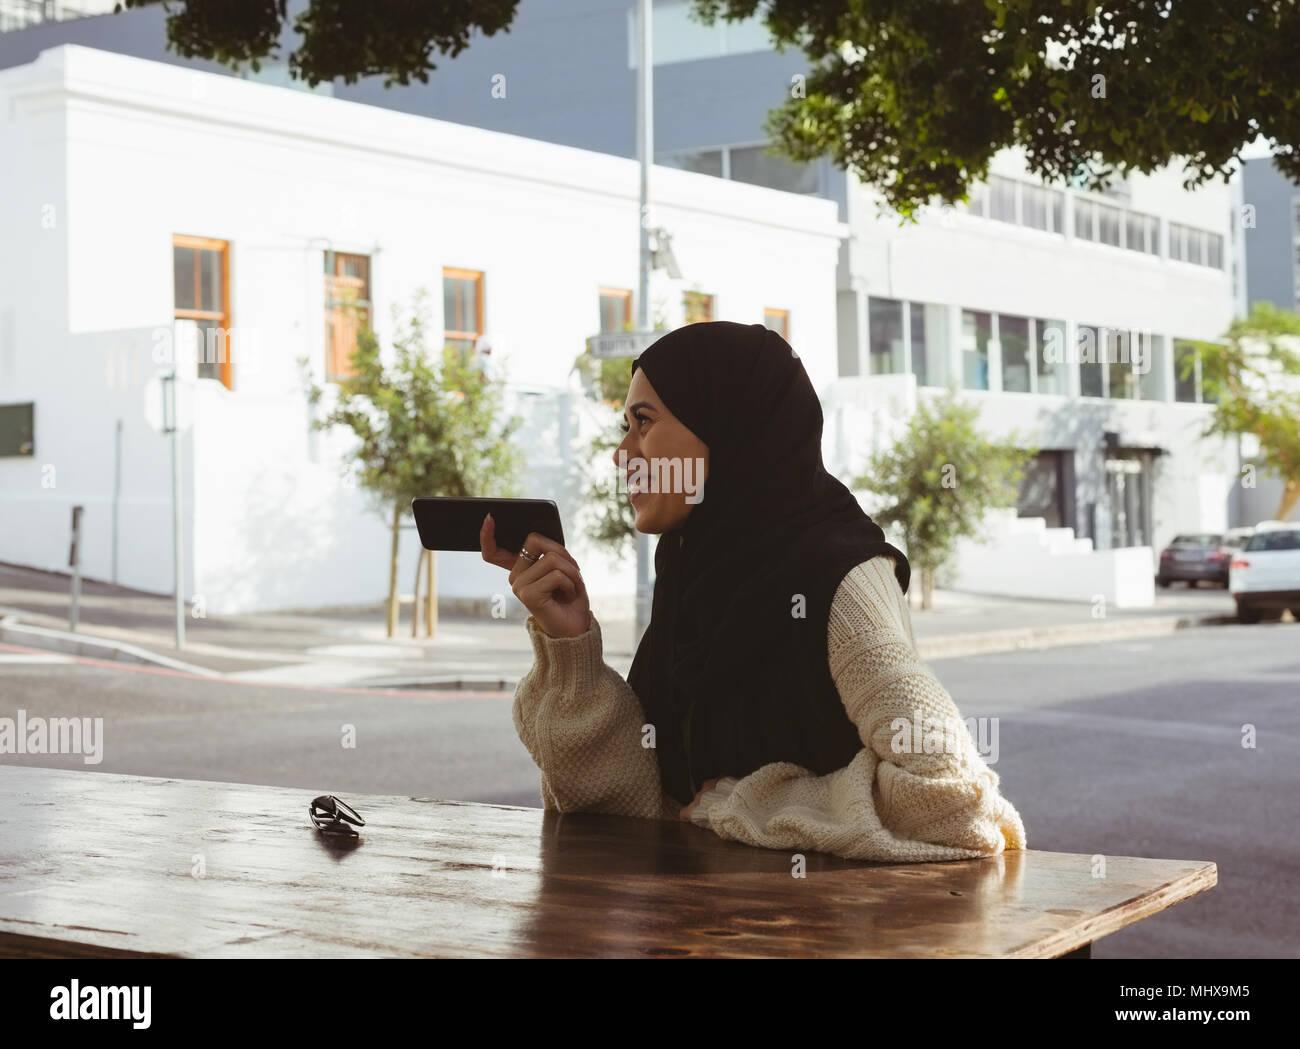 Urban hijab woman talking on mobile phone at pavement cafe - Stock Image